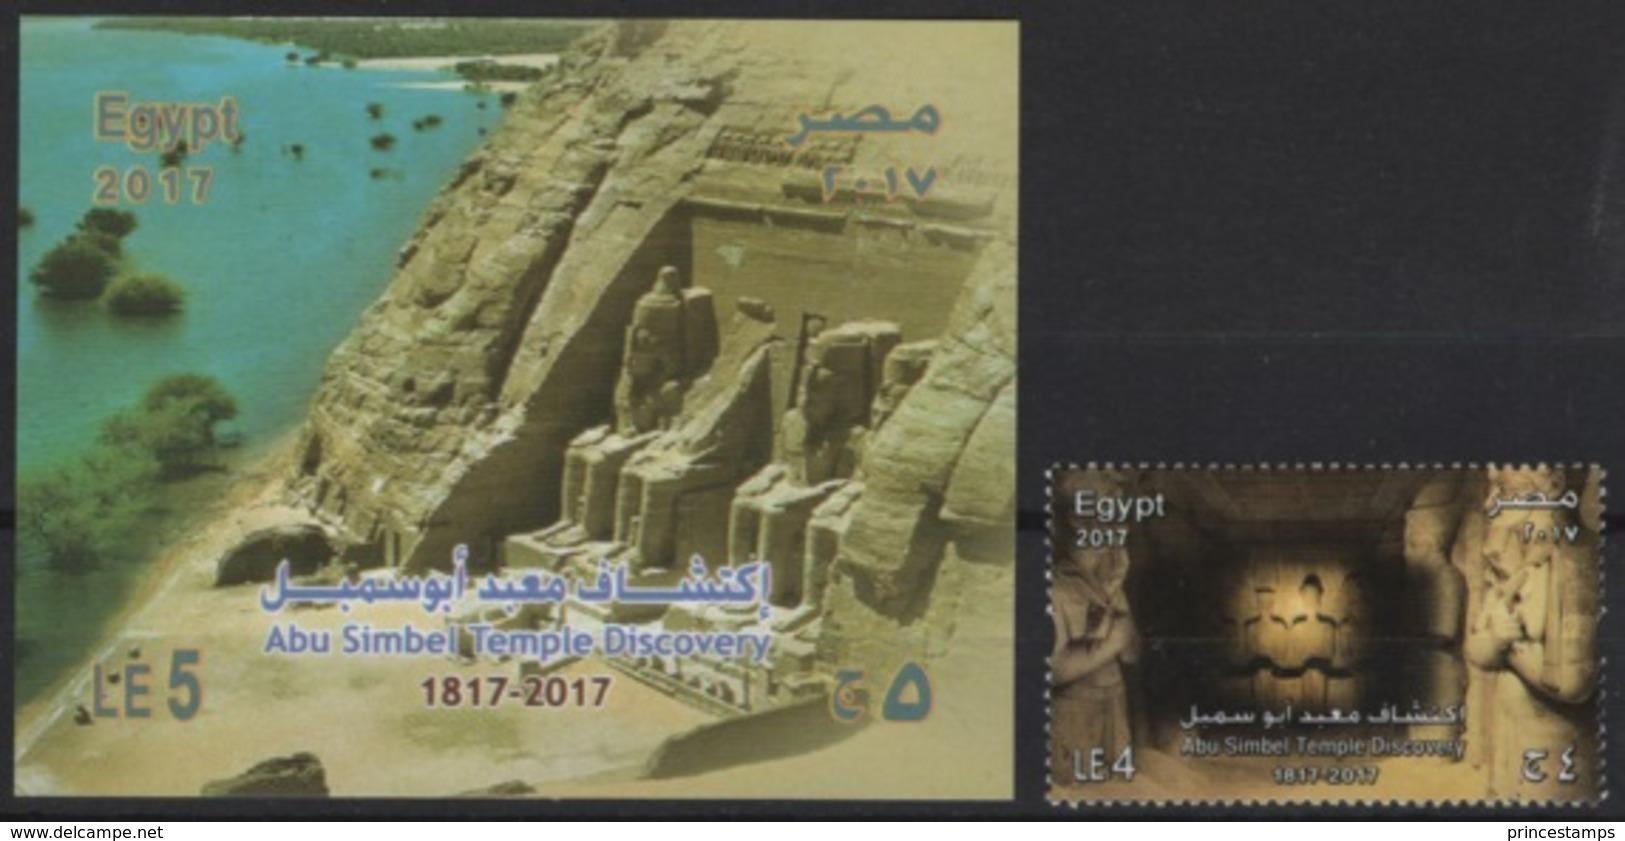 Egypt (2017) - Set + Block -  /   UNESCO World Heritage - Abu Simbel Temple Discovery - Egypte